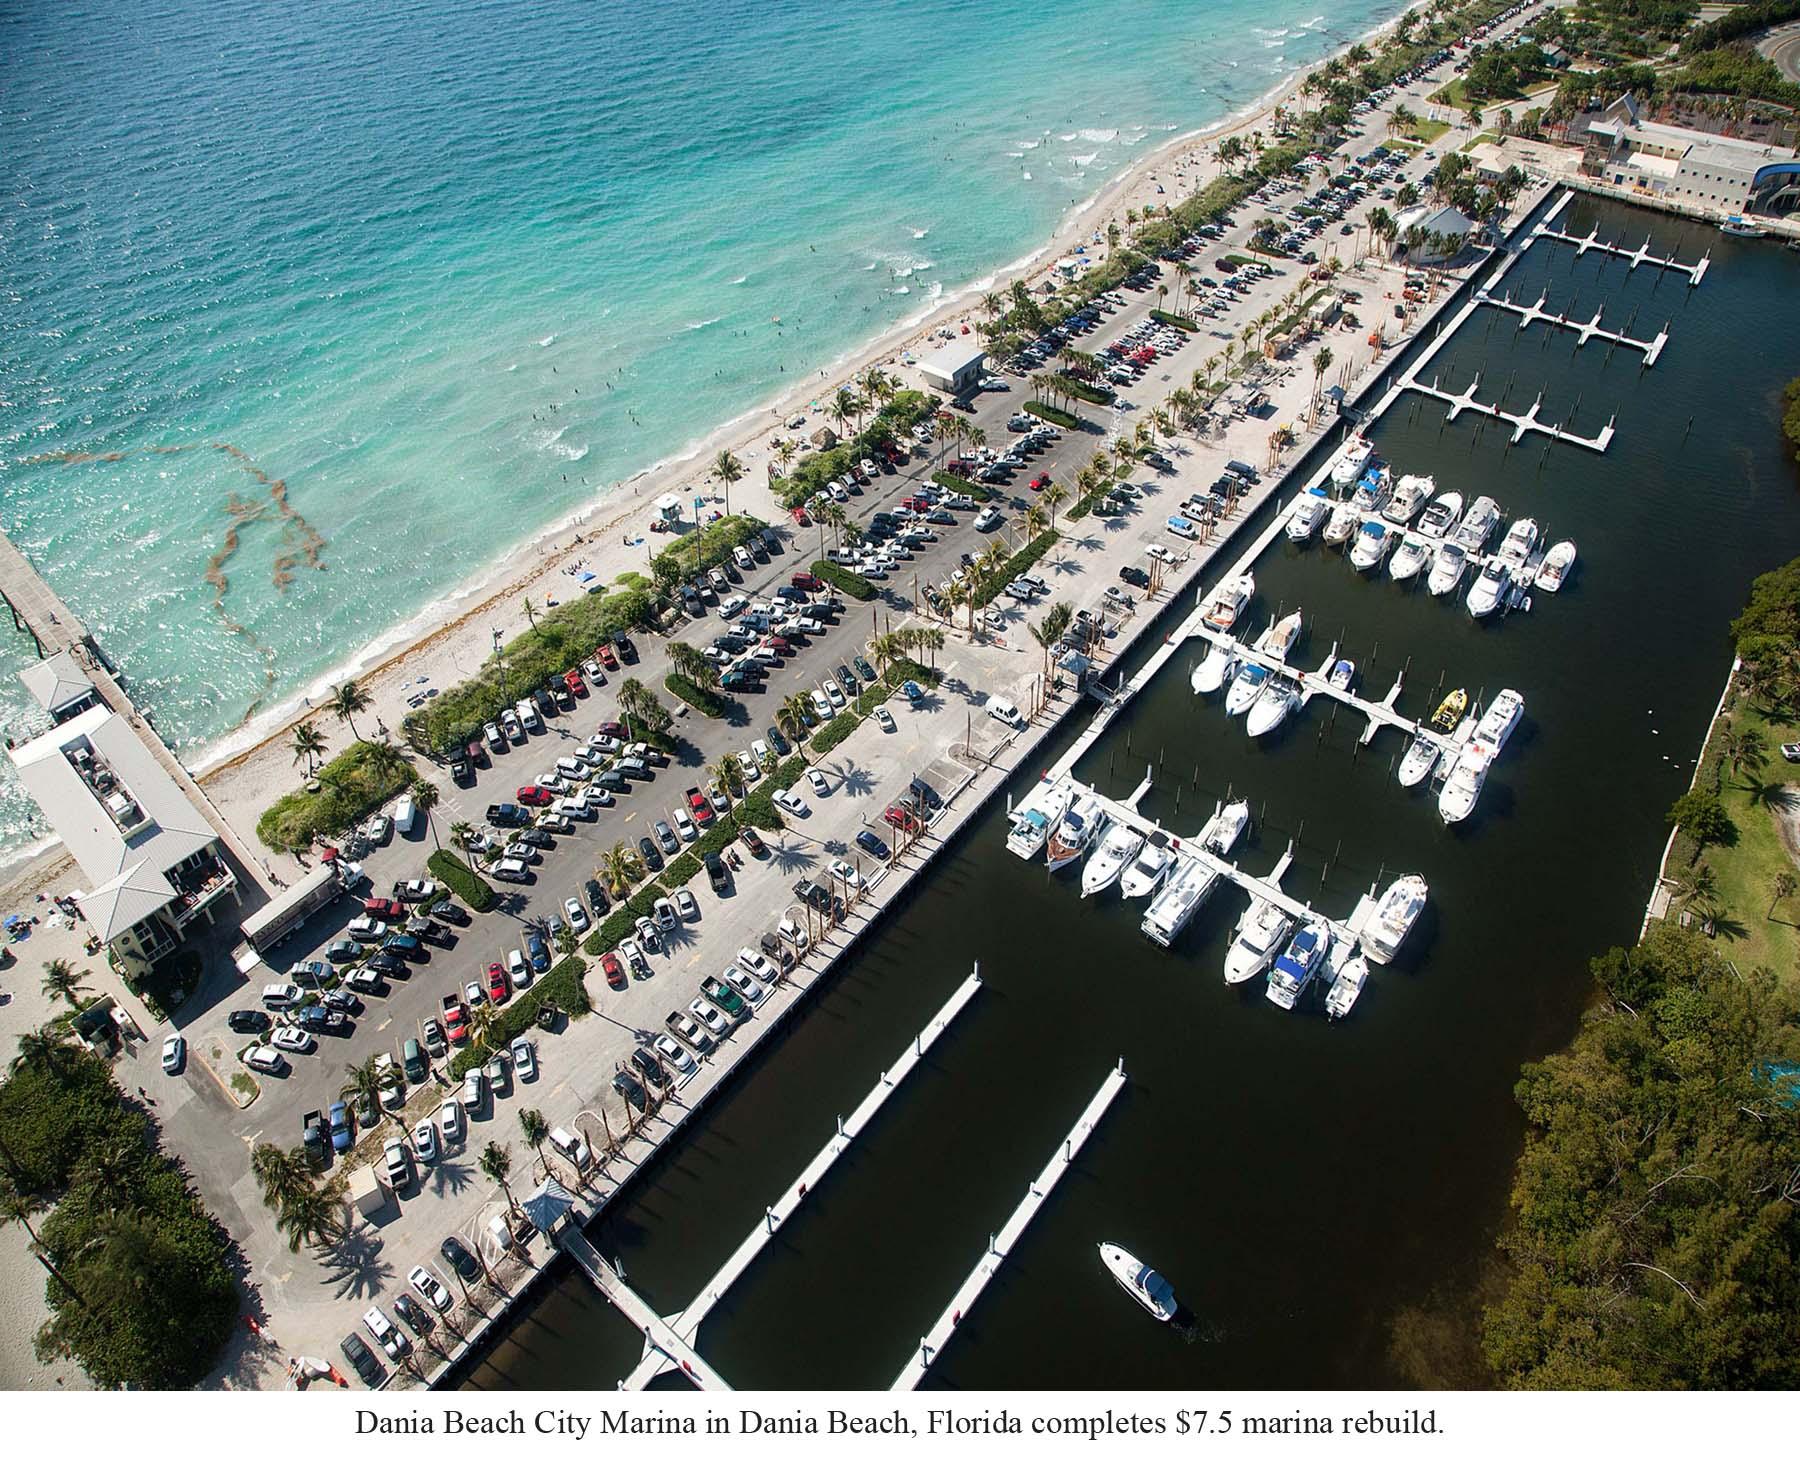 Concrete docks at Dania Beach Marina